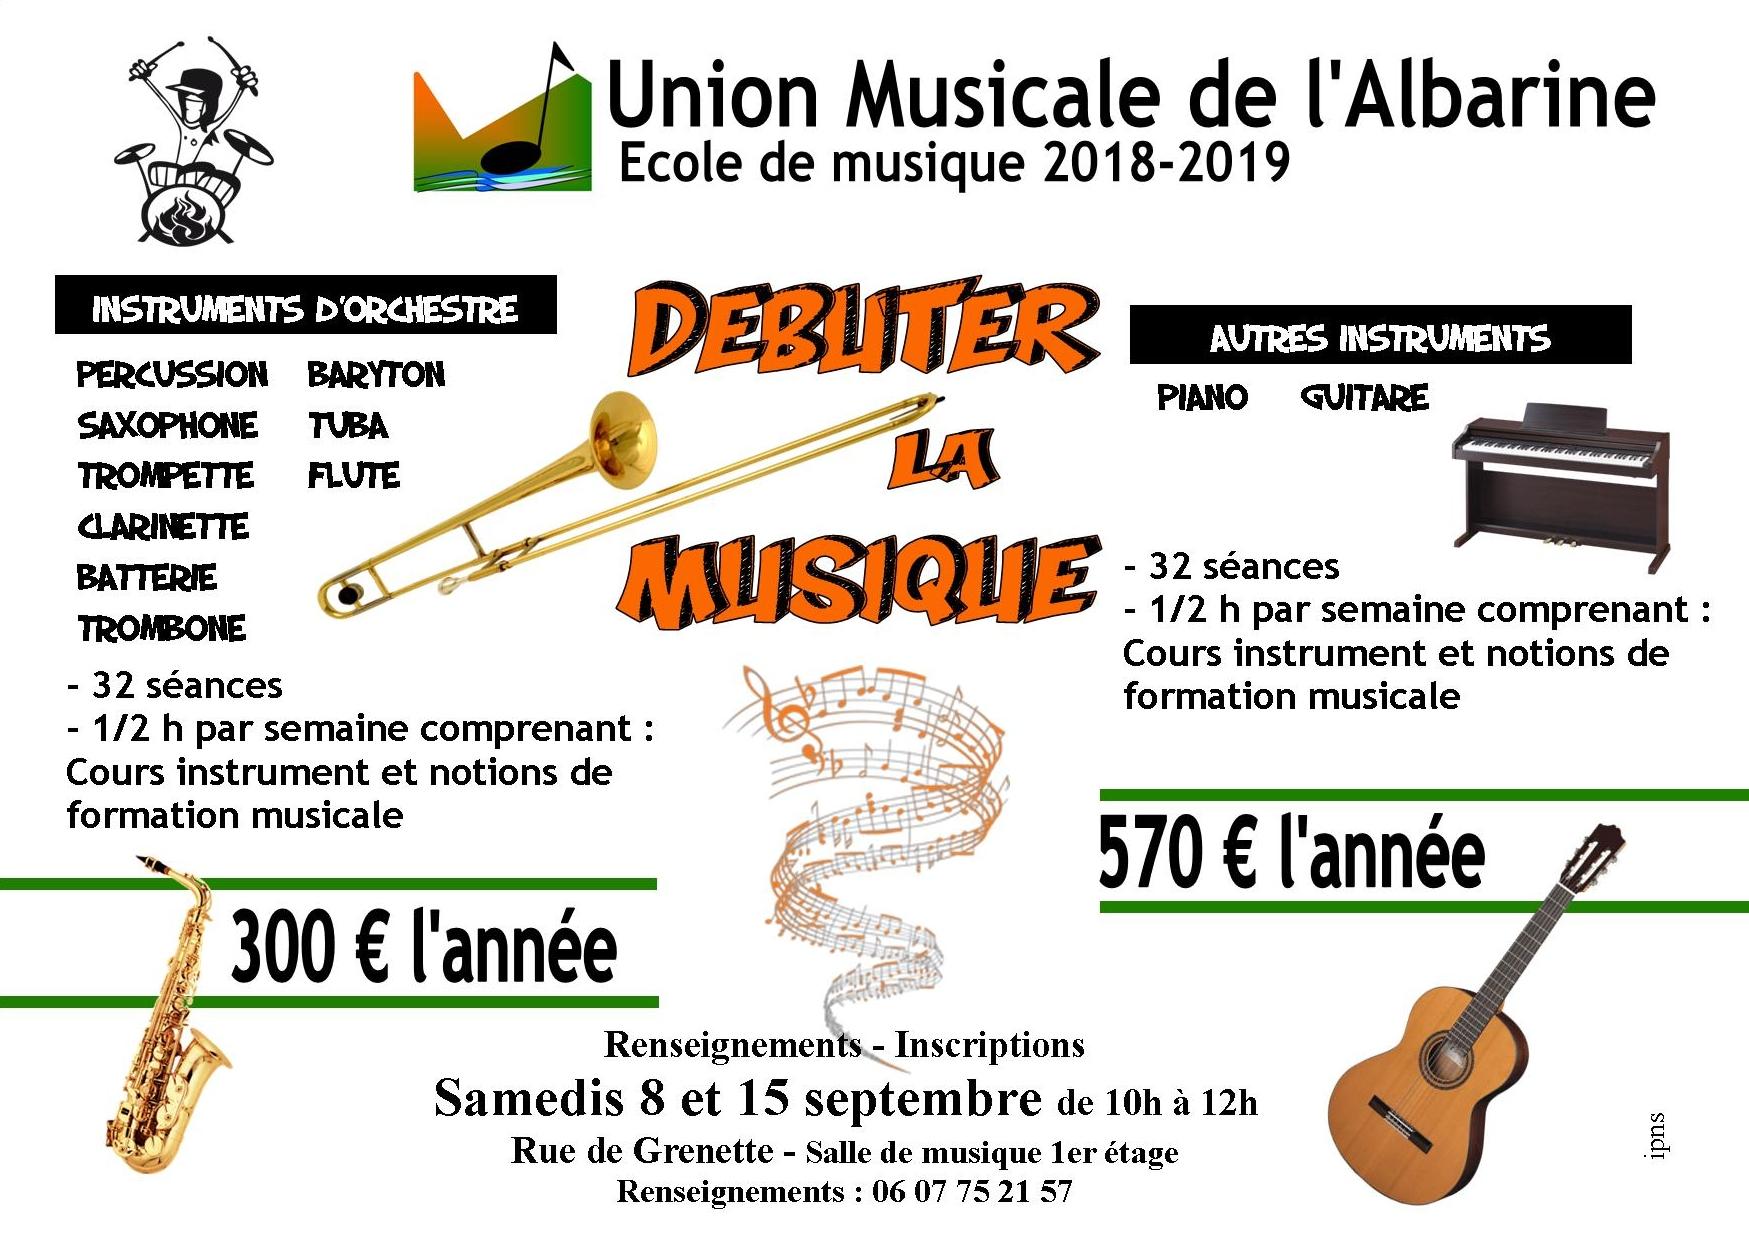 Tarifs 2018-2019 ecole union musicale albarine debutants